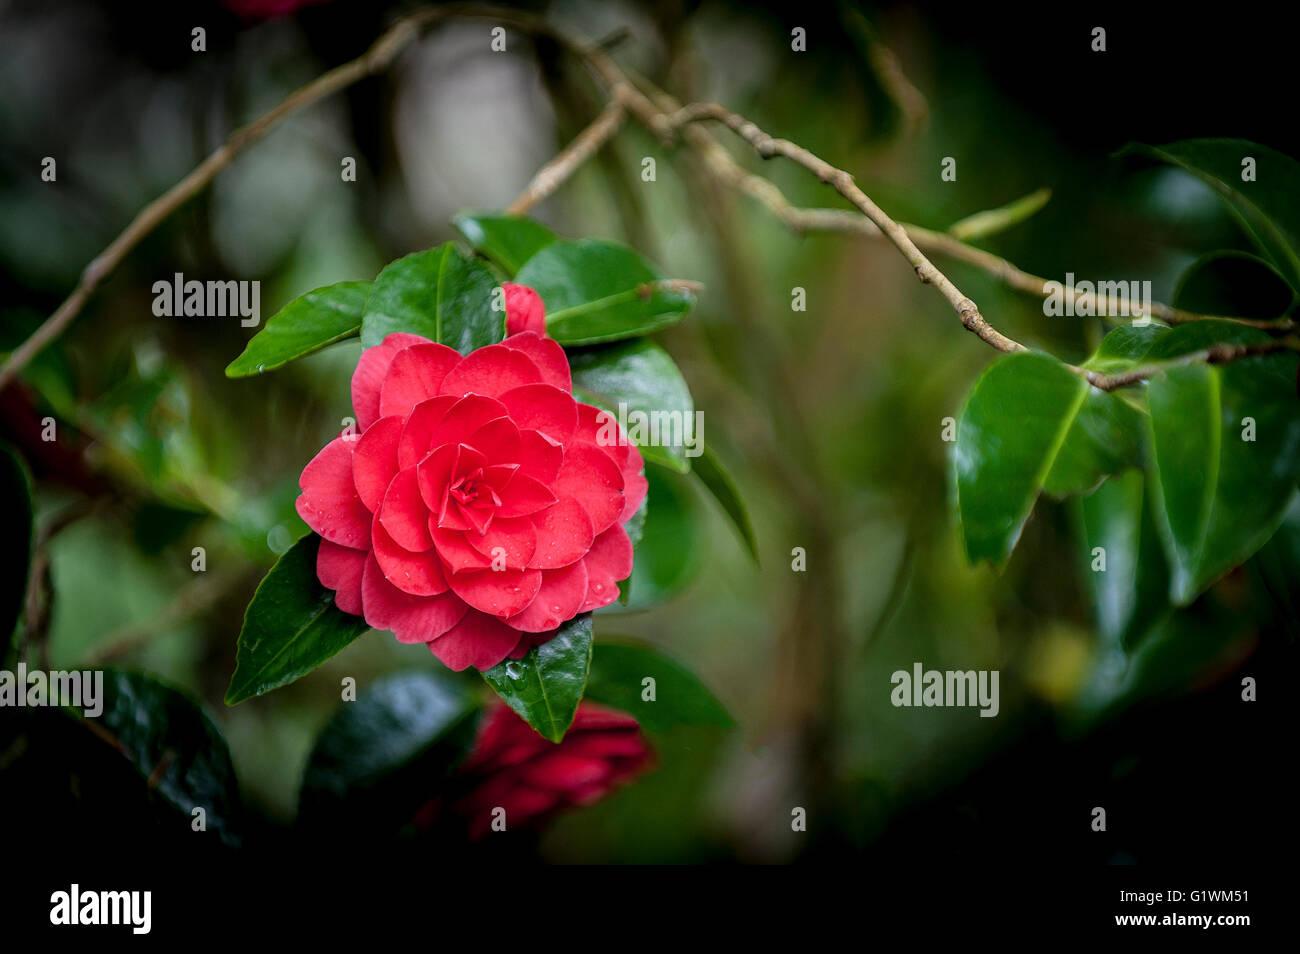 Camellia japonica; Mathotiana Alba. - Stock Image